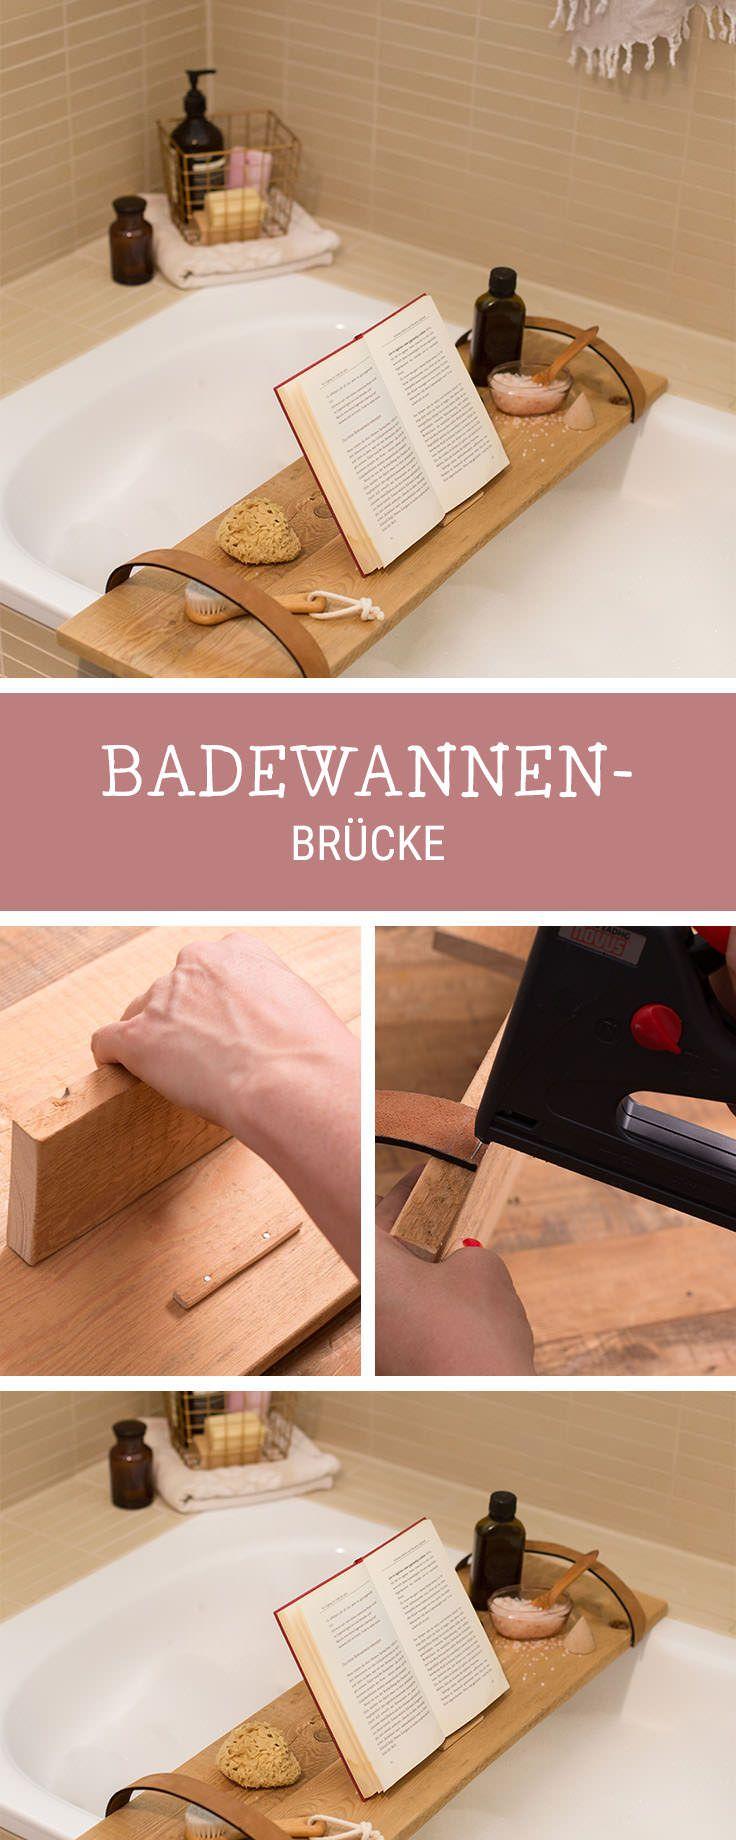 DIY-Anleitung: Badewannenbrücke aus Holz selber bauen via DaWanda ...